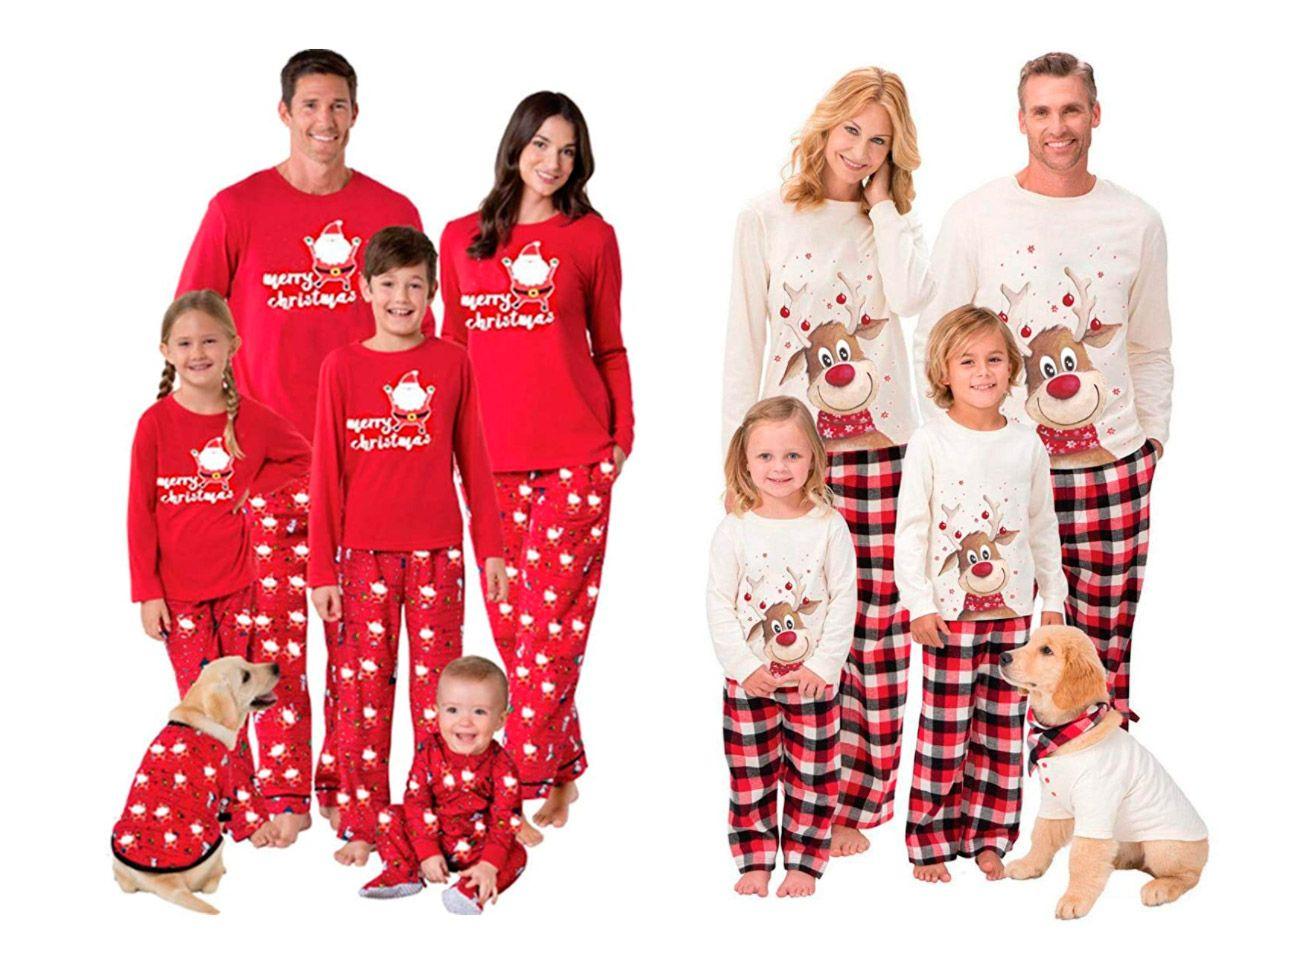 pijamas navideños de familia - padres, hijos y mascotas